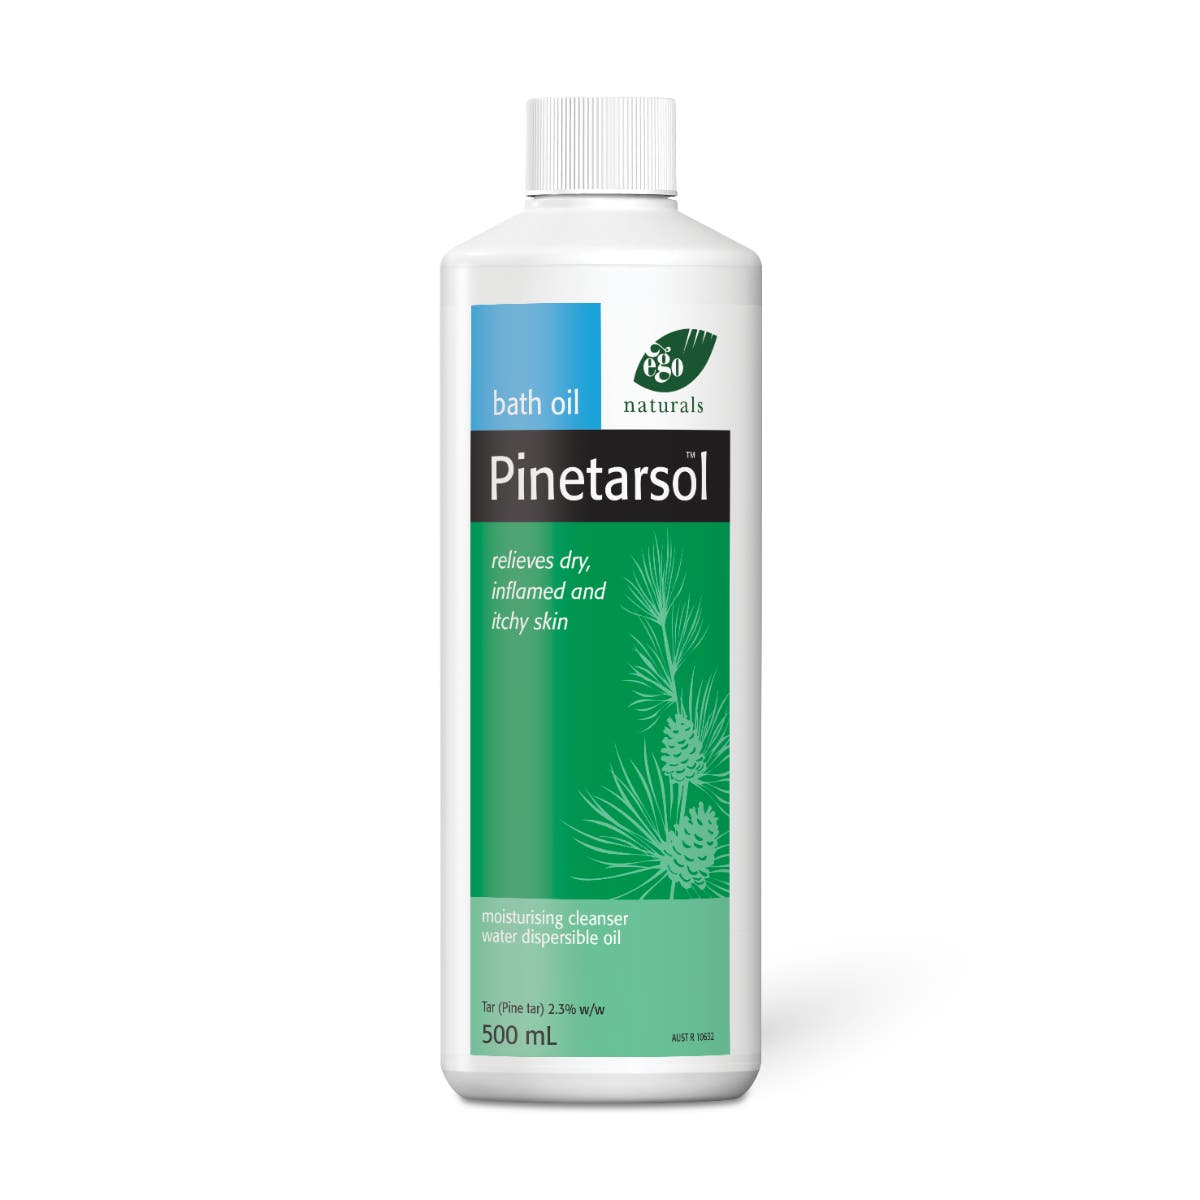 Pinetarsol Bath Oil 500mL